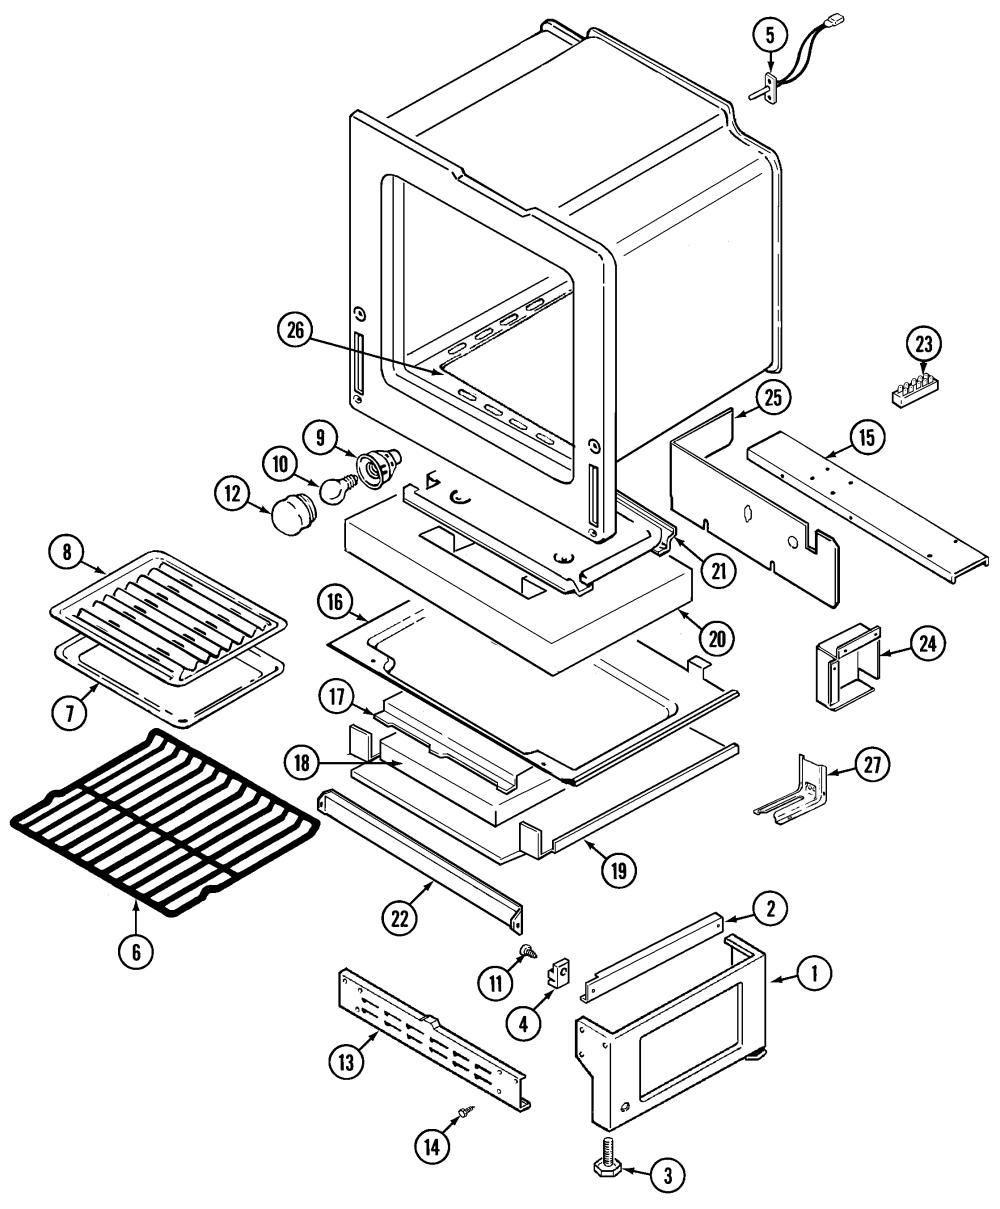 medium resolution of crg9700cam range oven base parts diagram